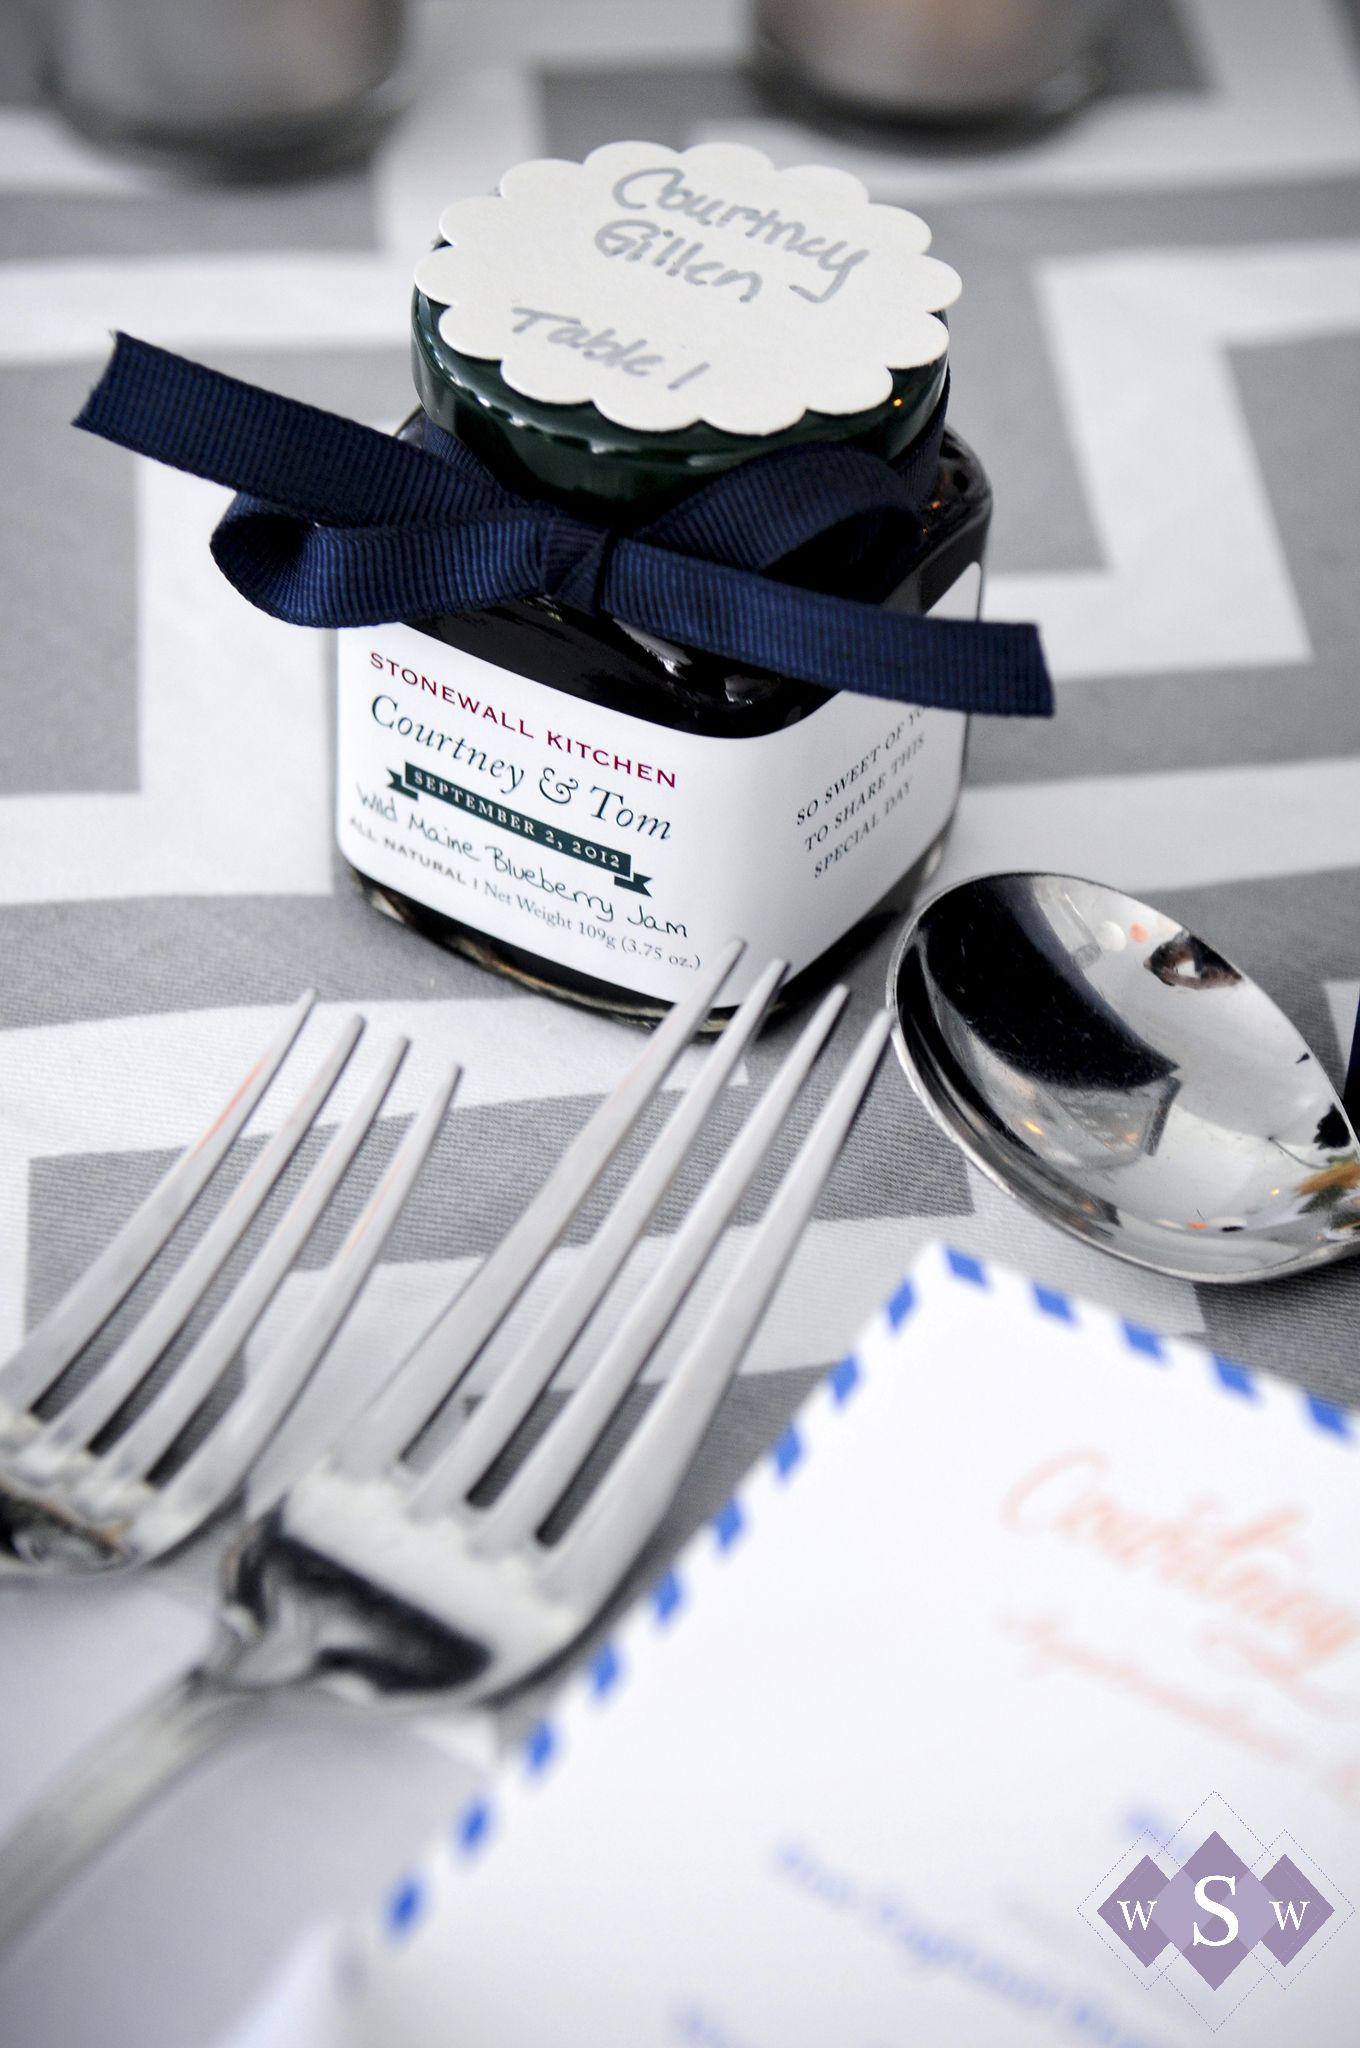 Blueberry jam wedding favors - Peaks Island Wedding - Inn at Peaks ...